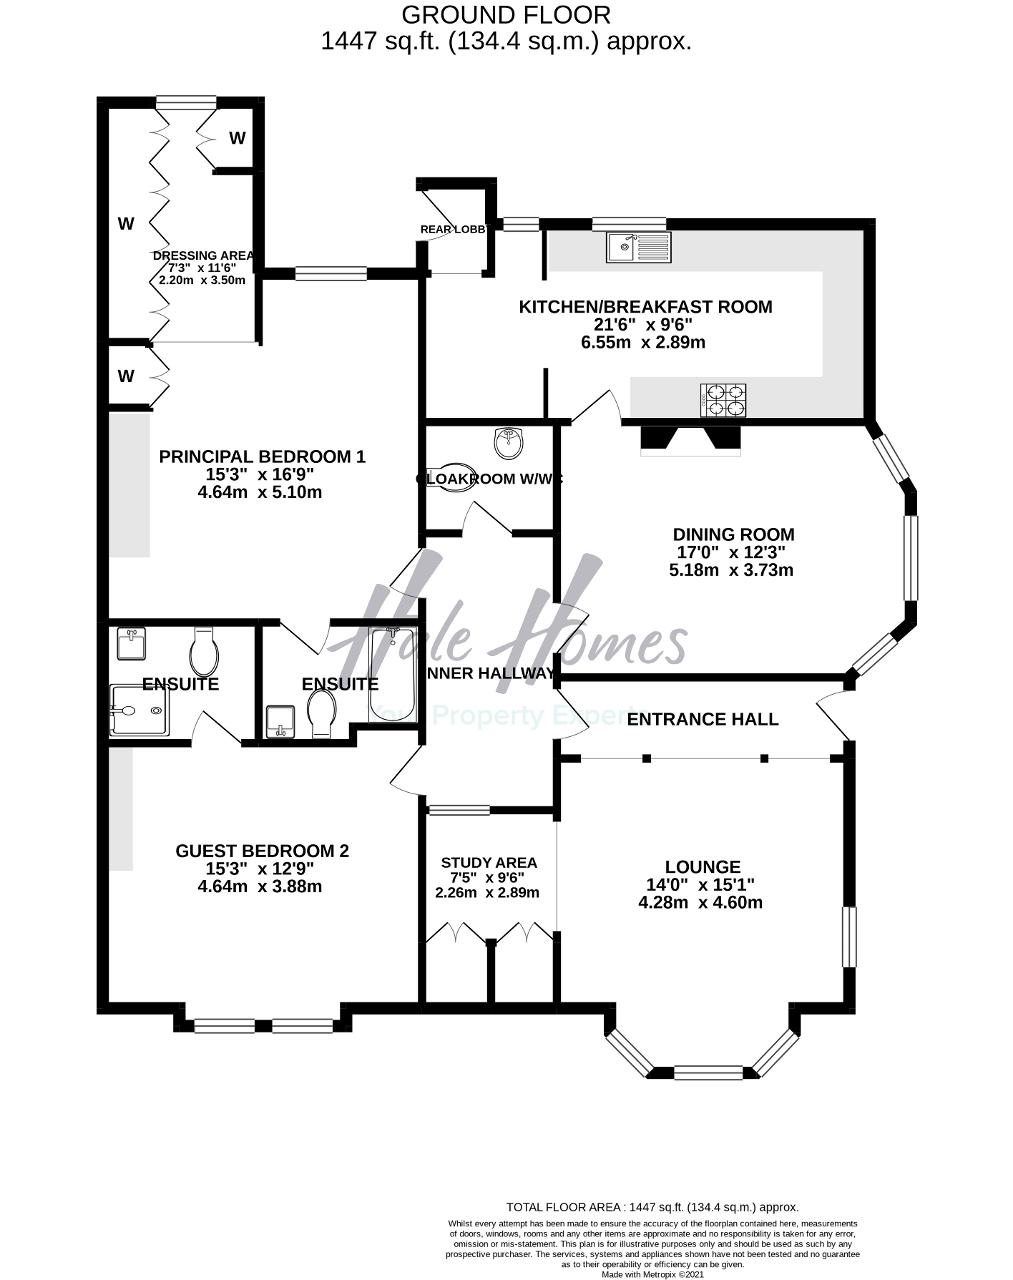 Floorplan of Heald Lawn, Heald Road, Bowdon, Cheshire, WA14 2JD